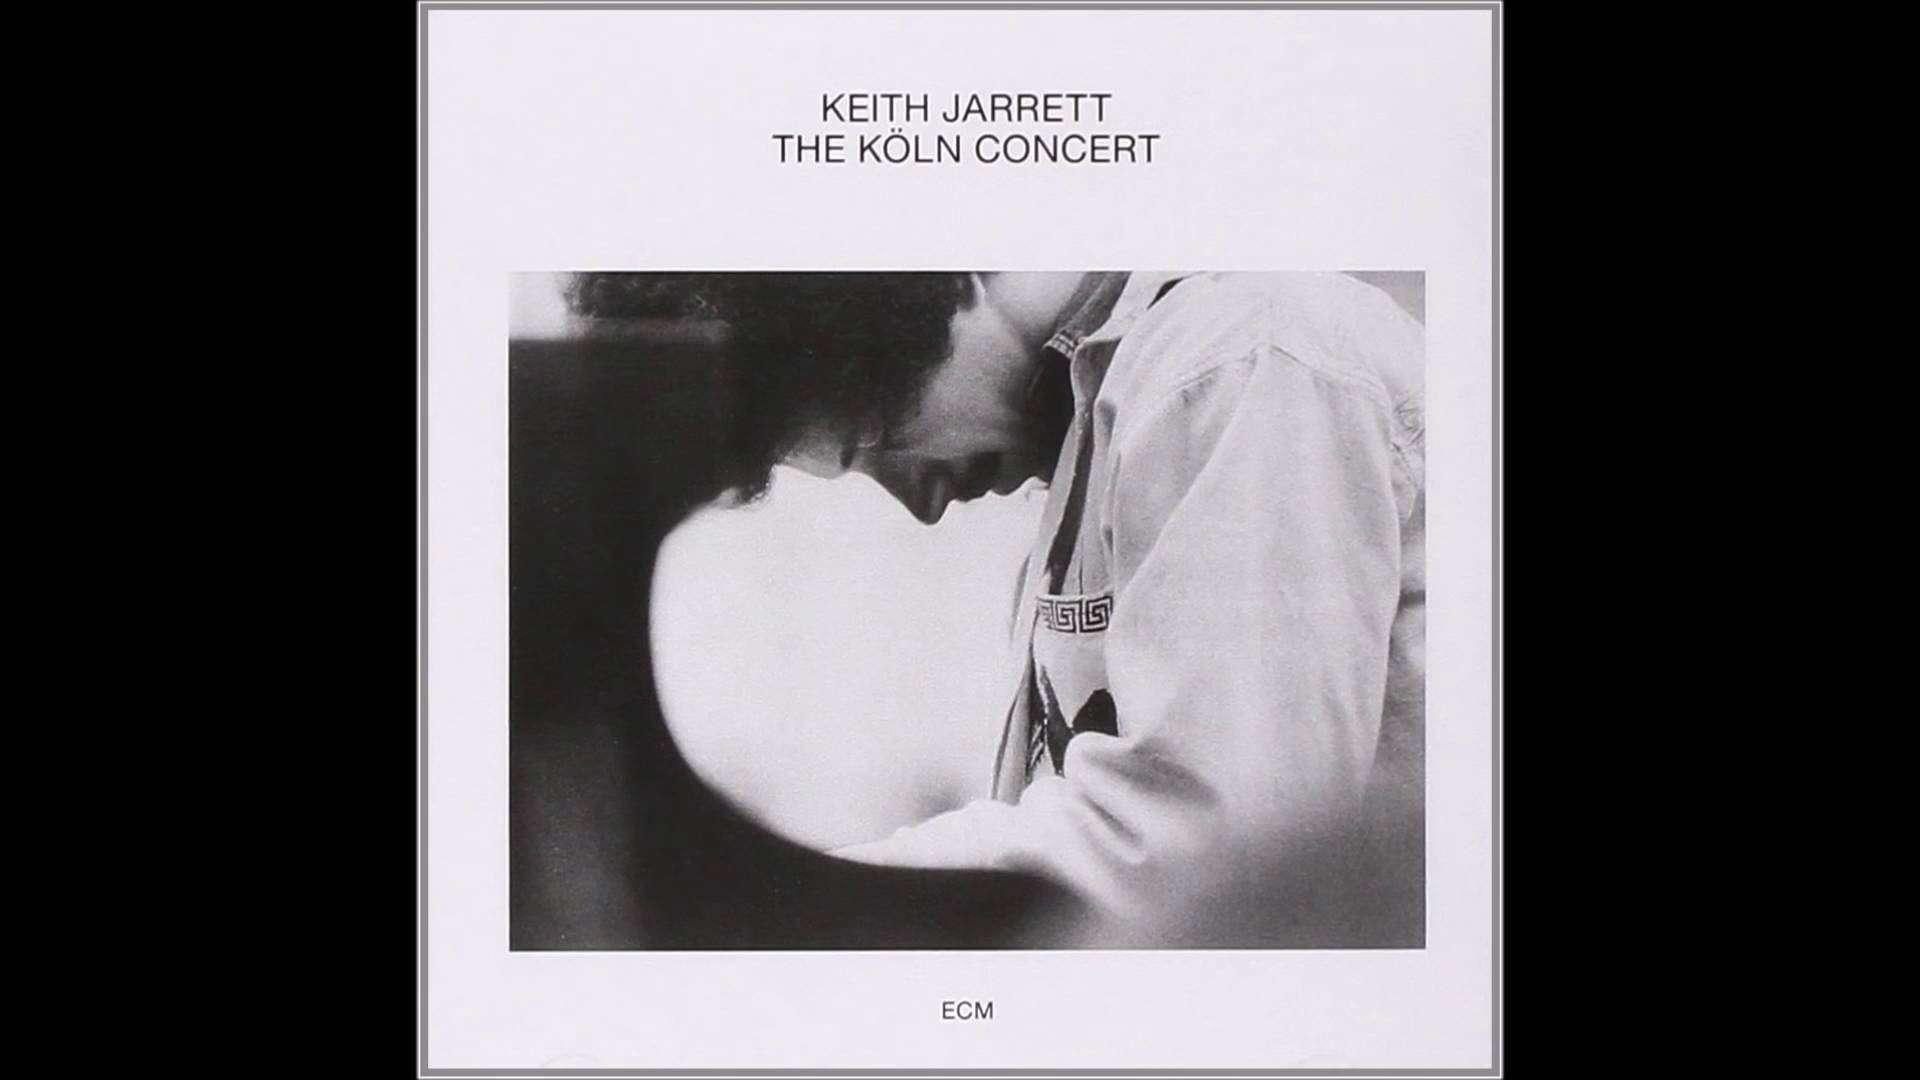 Keith Jarrett | The Köln Concert - Part IIc - YouTube